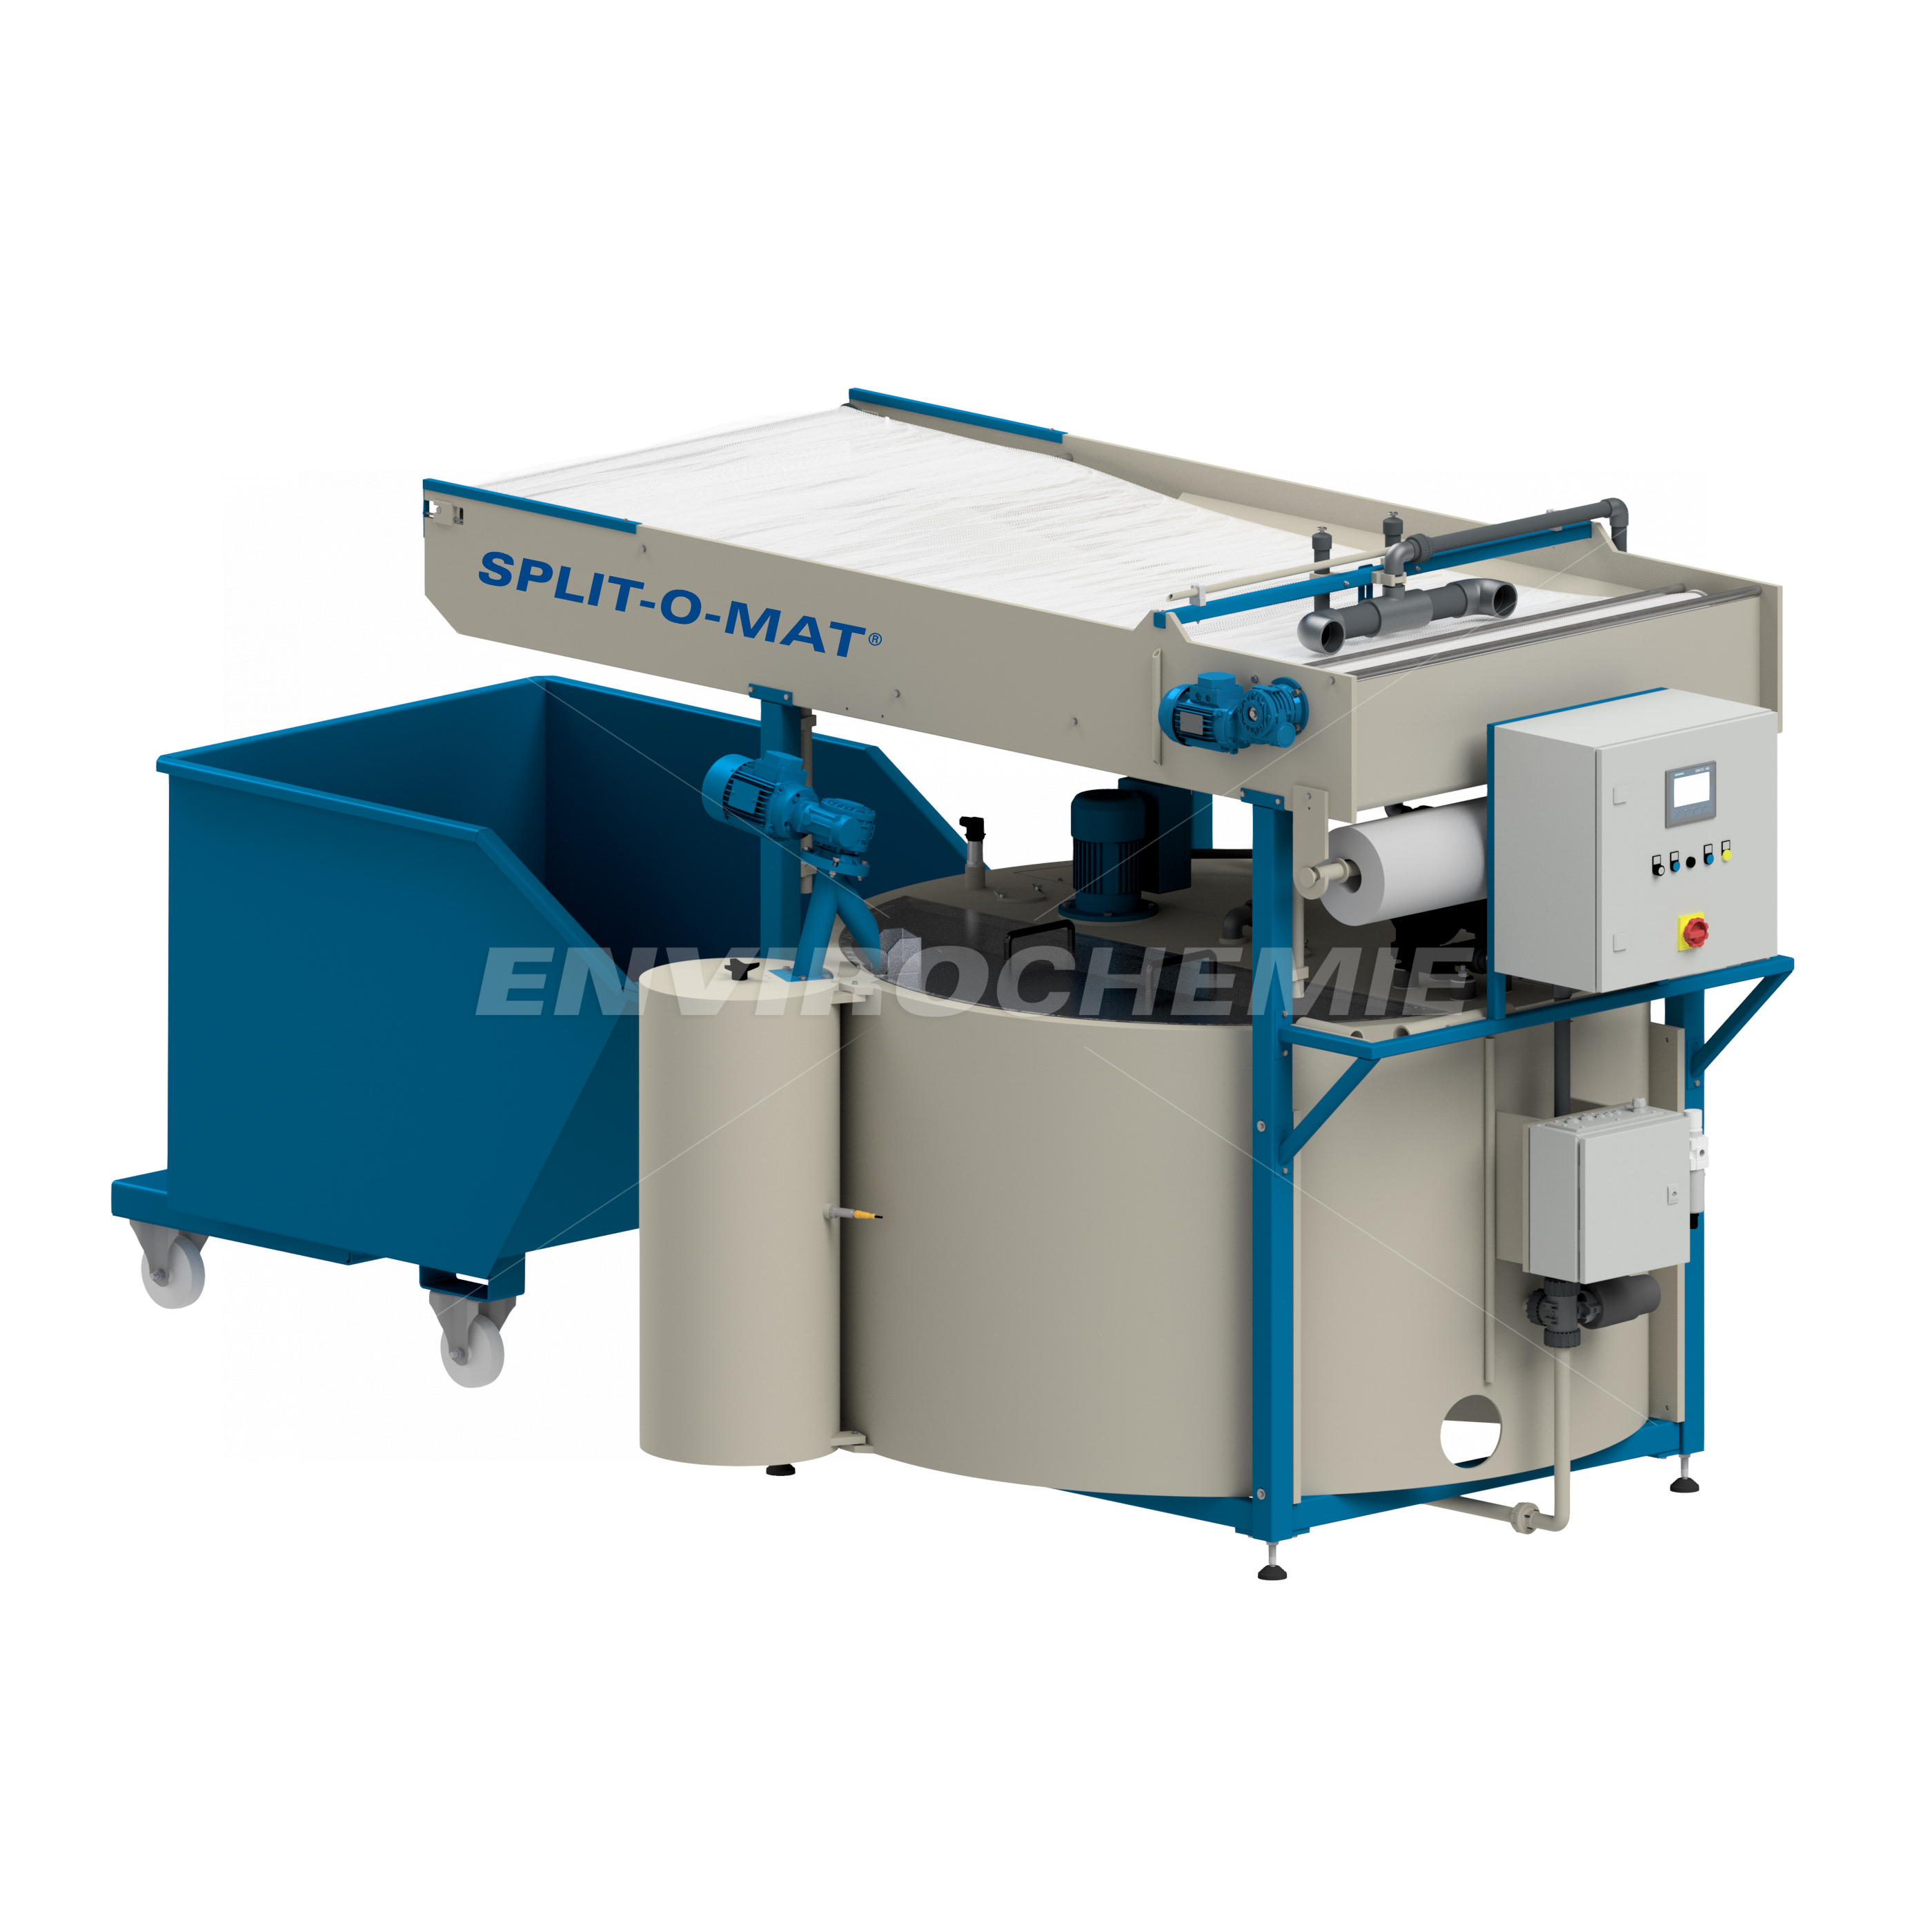 Kompakte Abwasserbehandlungsanlage Split-O-Mat®